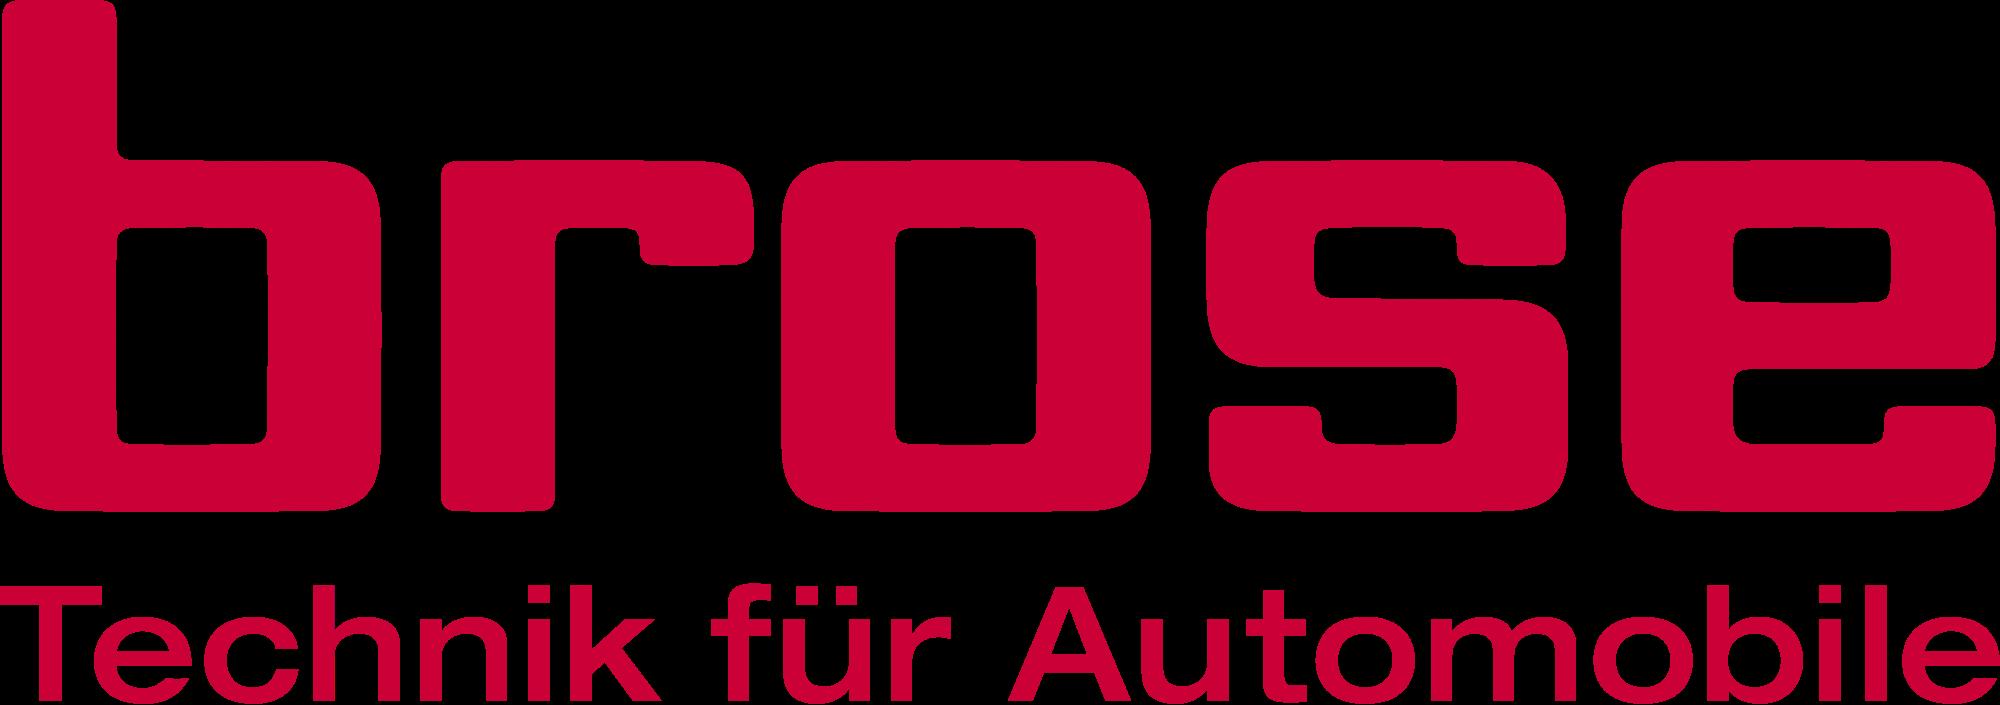 Brose Fahrzeugteile GmbH & Co. KG Logo